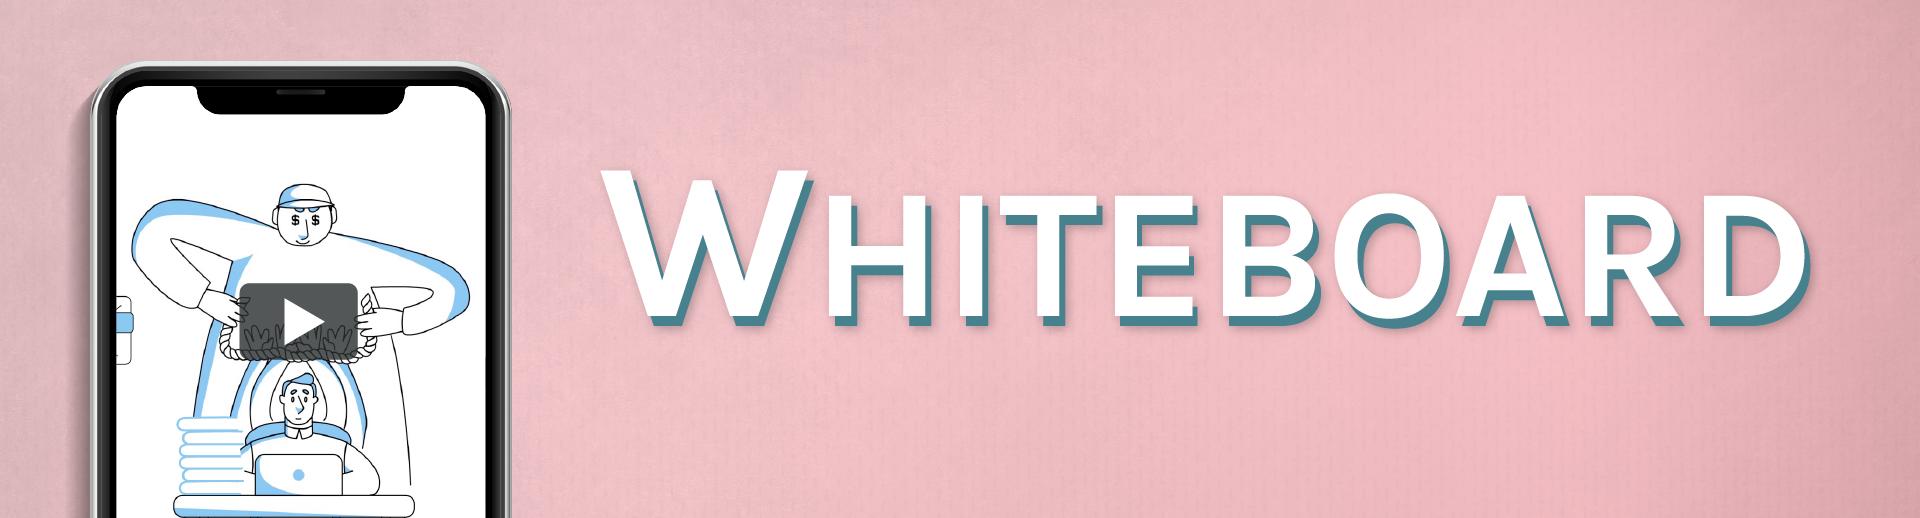 Whiteboard_thumbnail